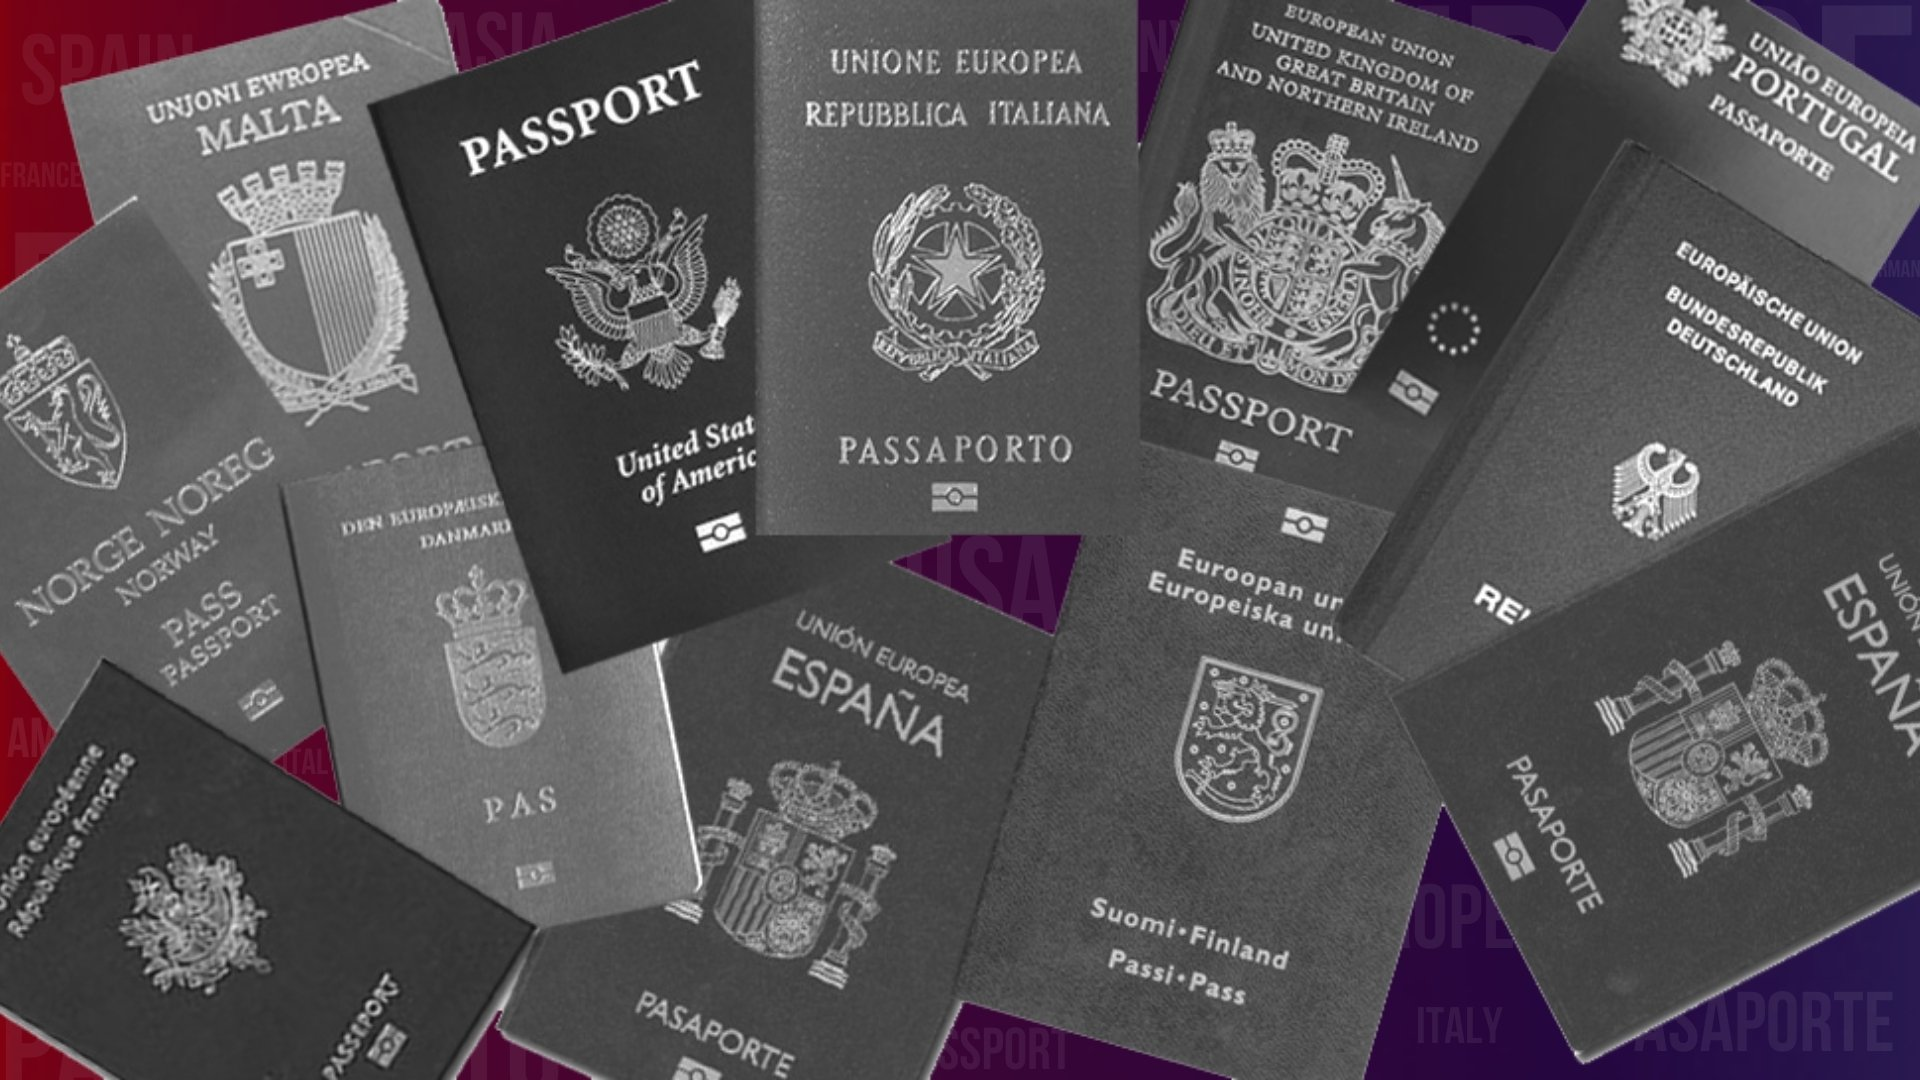 Bosman Passport Cotonou Passport